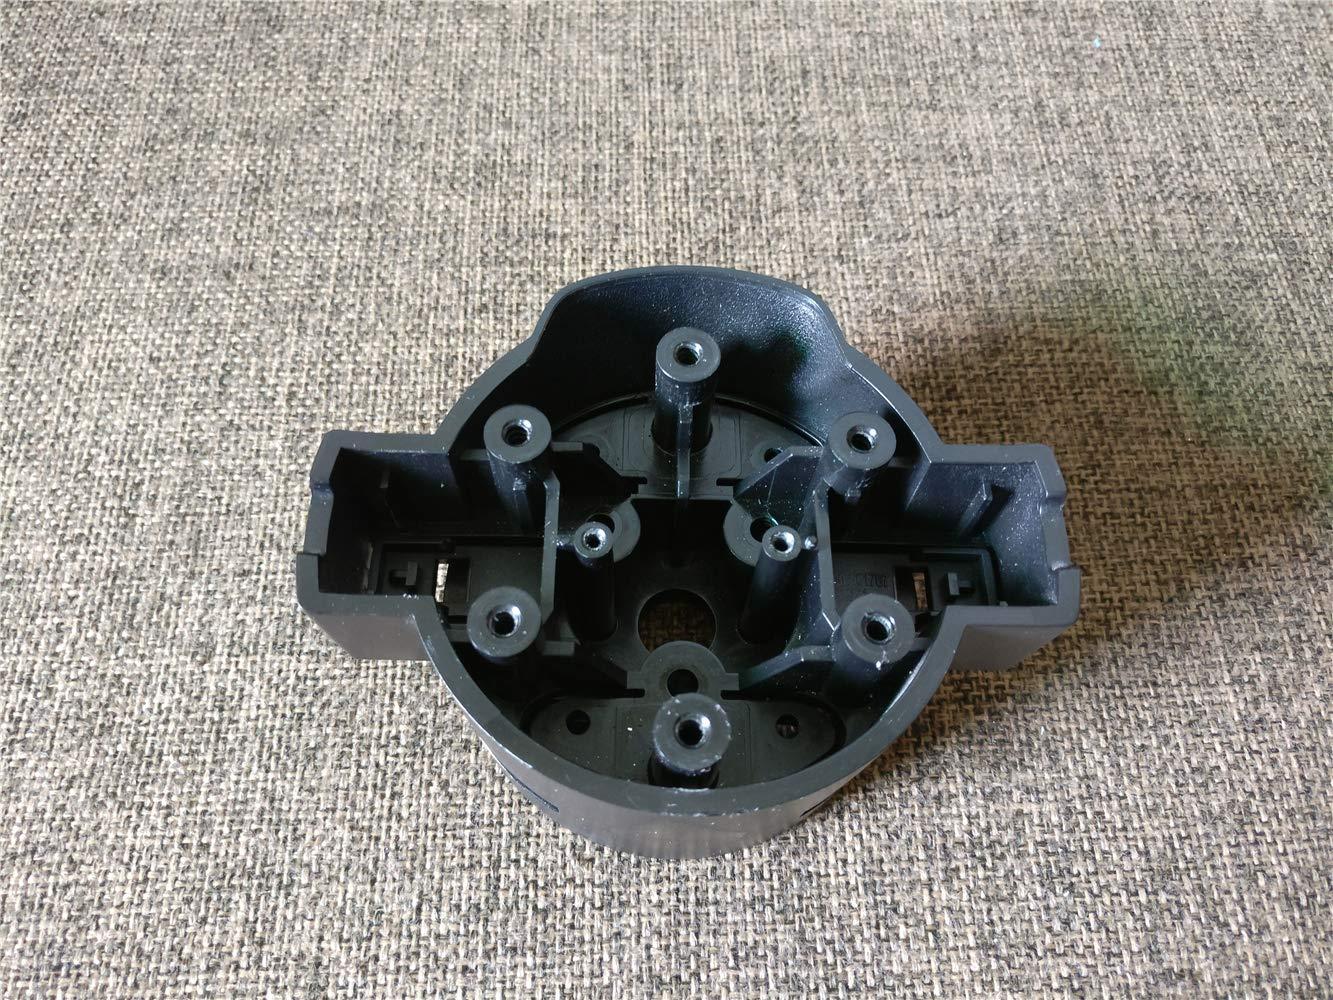 aikeec Logitech G29 G27 Plus Base Housing Accessories Damaged Repair Parts Steering Wheel Mount Accessories